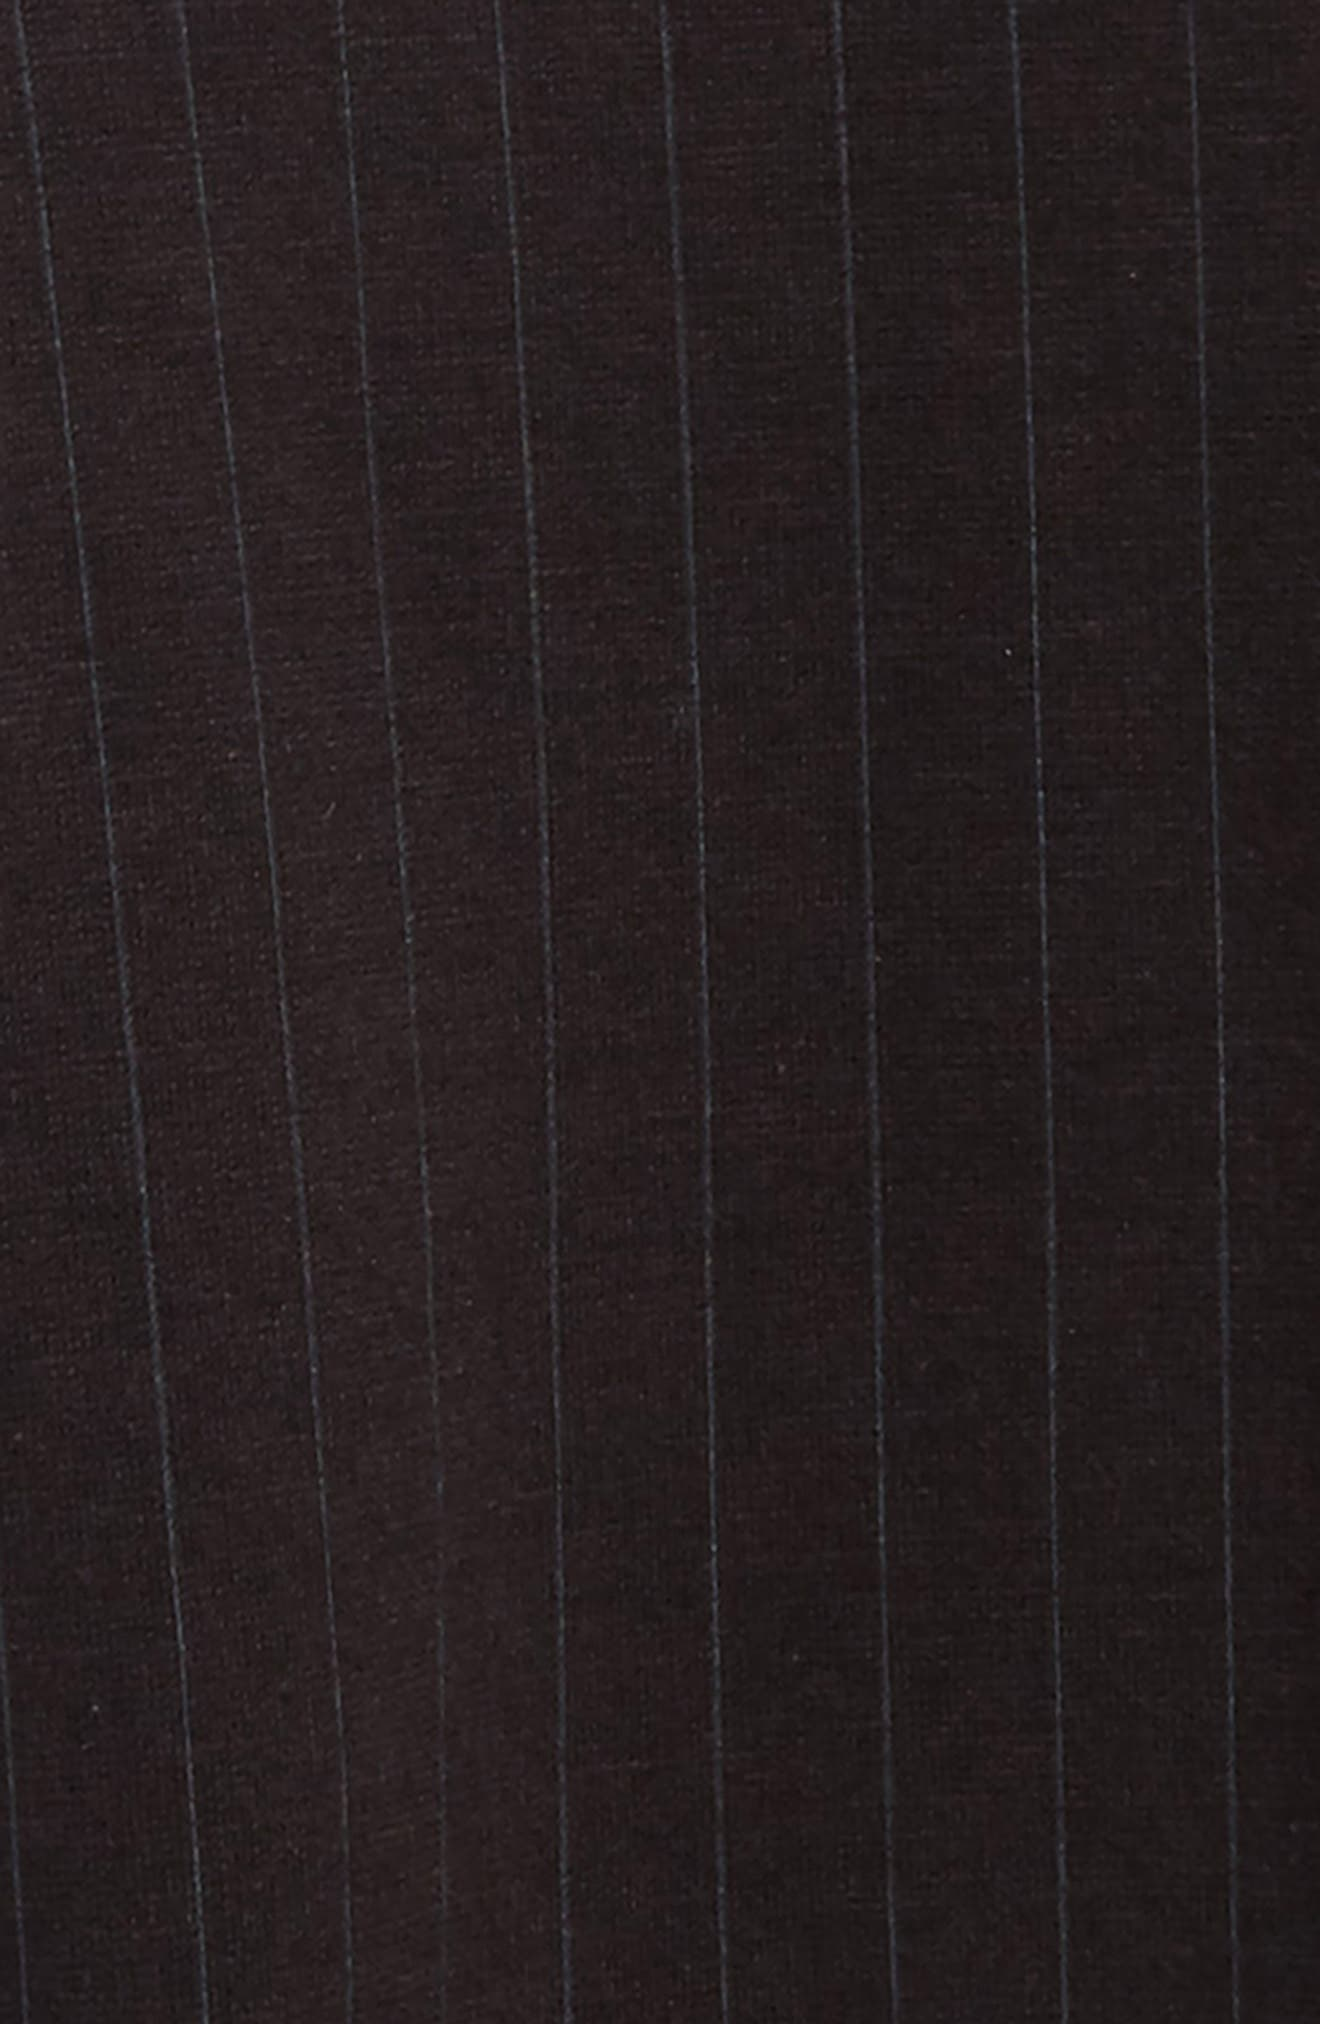 Pinstripe Jogger Pants,                             Alternate thumbnail 2, color,                             001